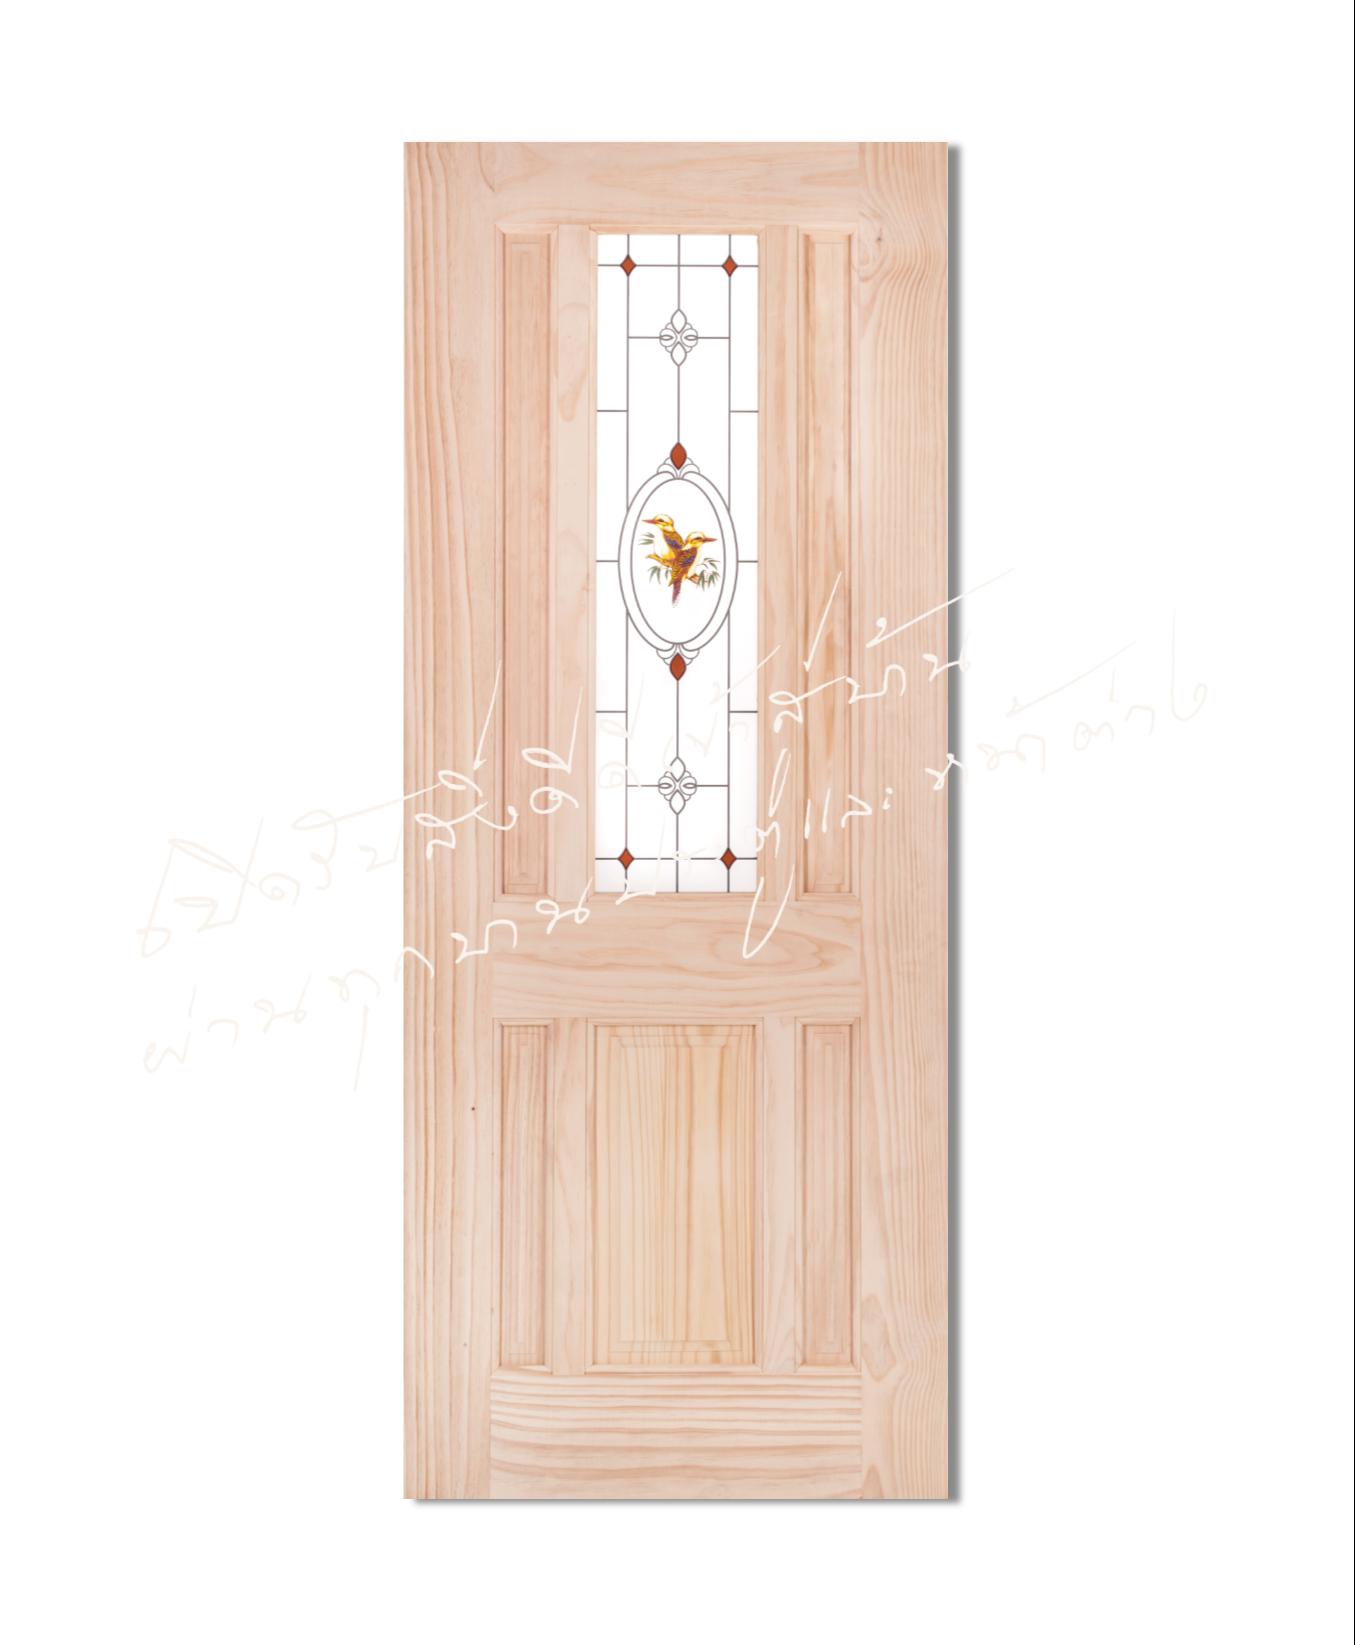 Burra ประตูไม้จริง ไม้สนนิวซีแลนด์